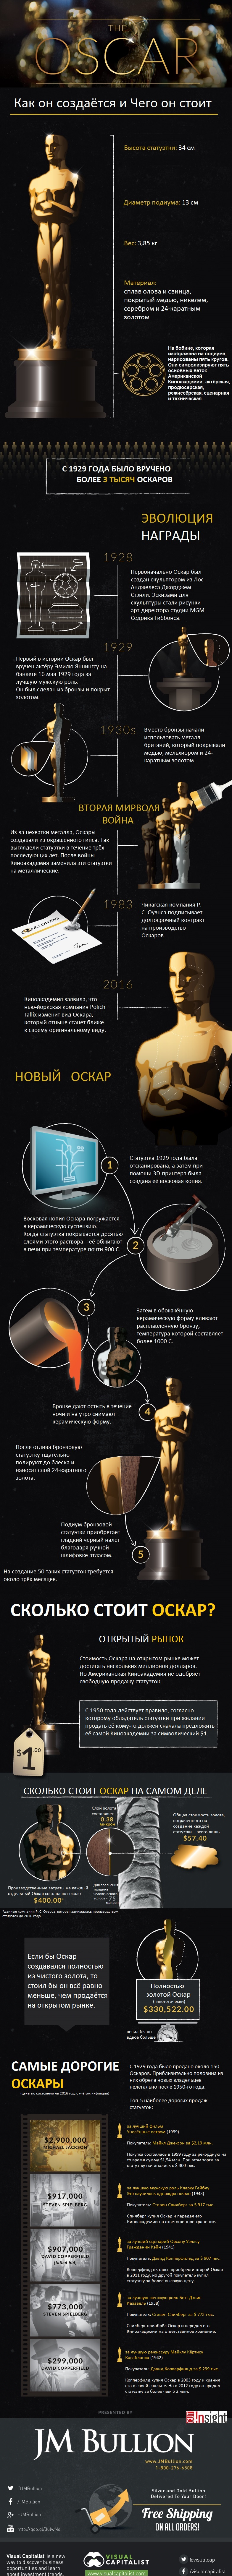 Оскар инфографика